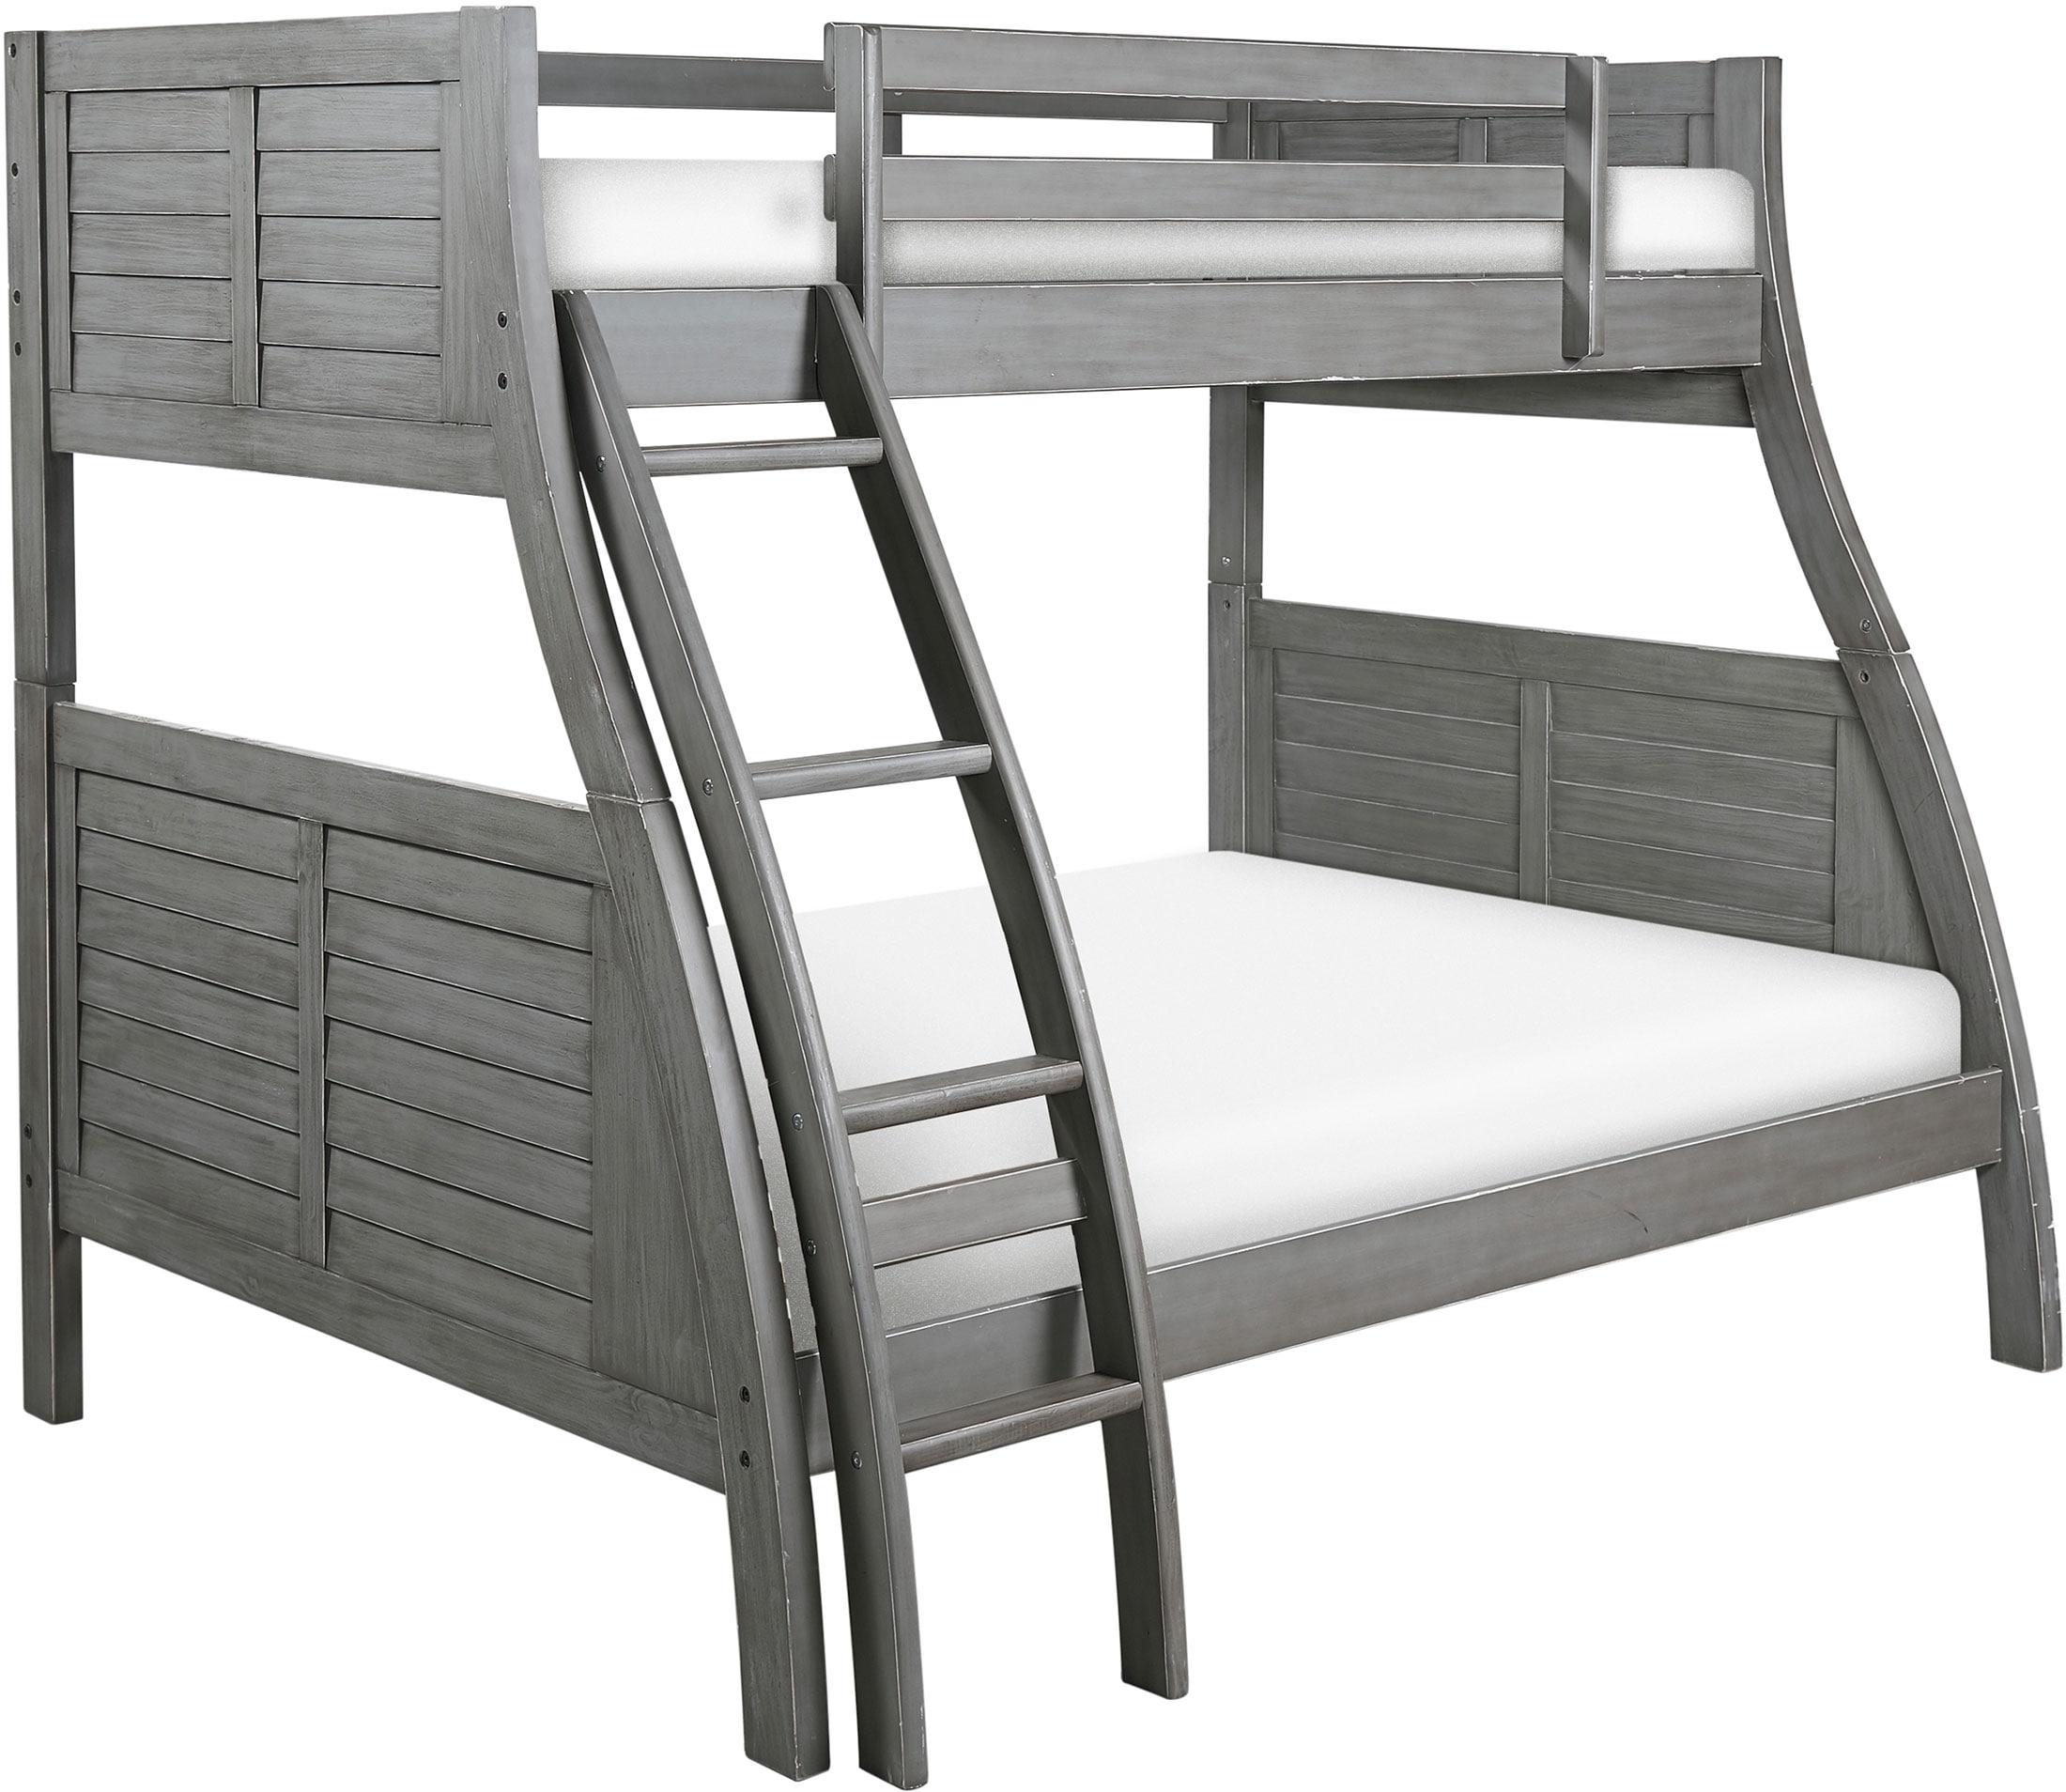 Bedroom Furniture - Easton Bunk Bed